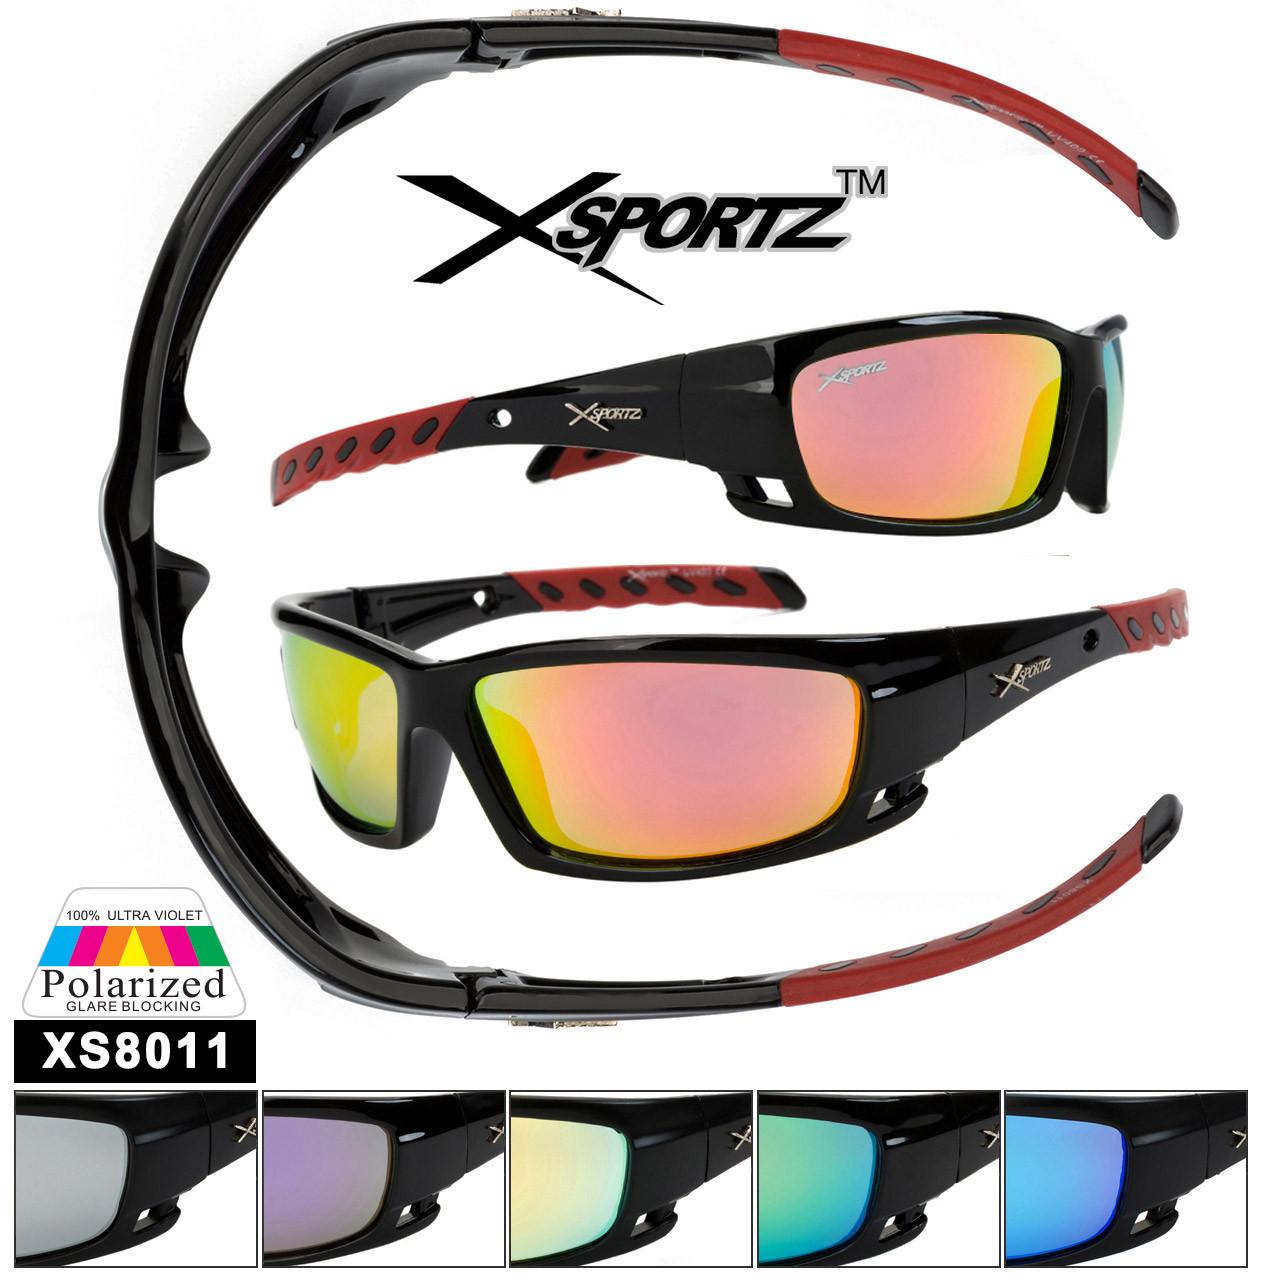 Polarized Xsportz™ Sunglasses Wholesale  - Style XS8011 (Assorted Colors) (12 pcs.)